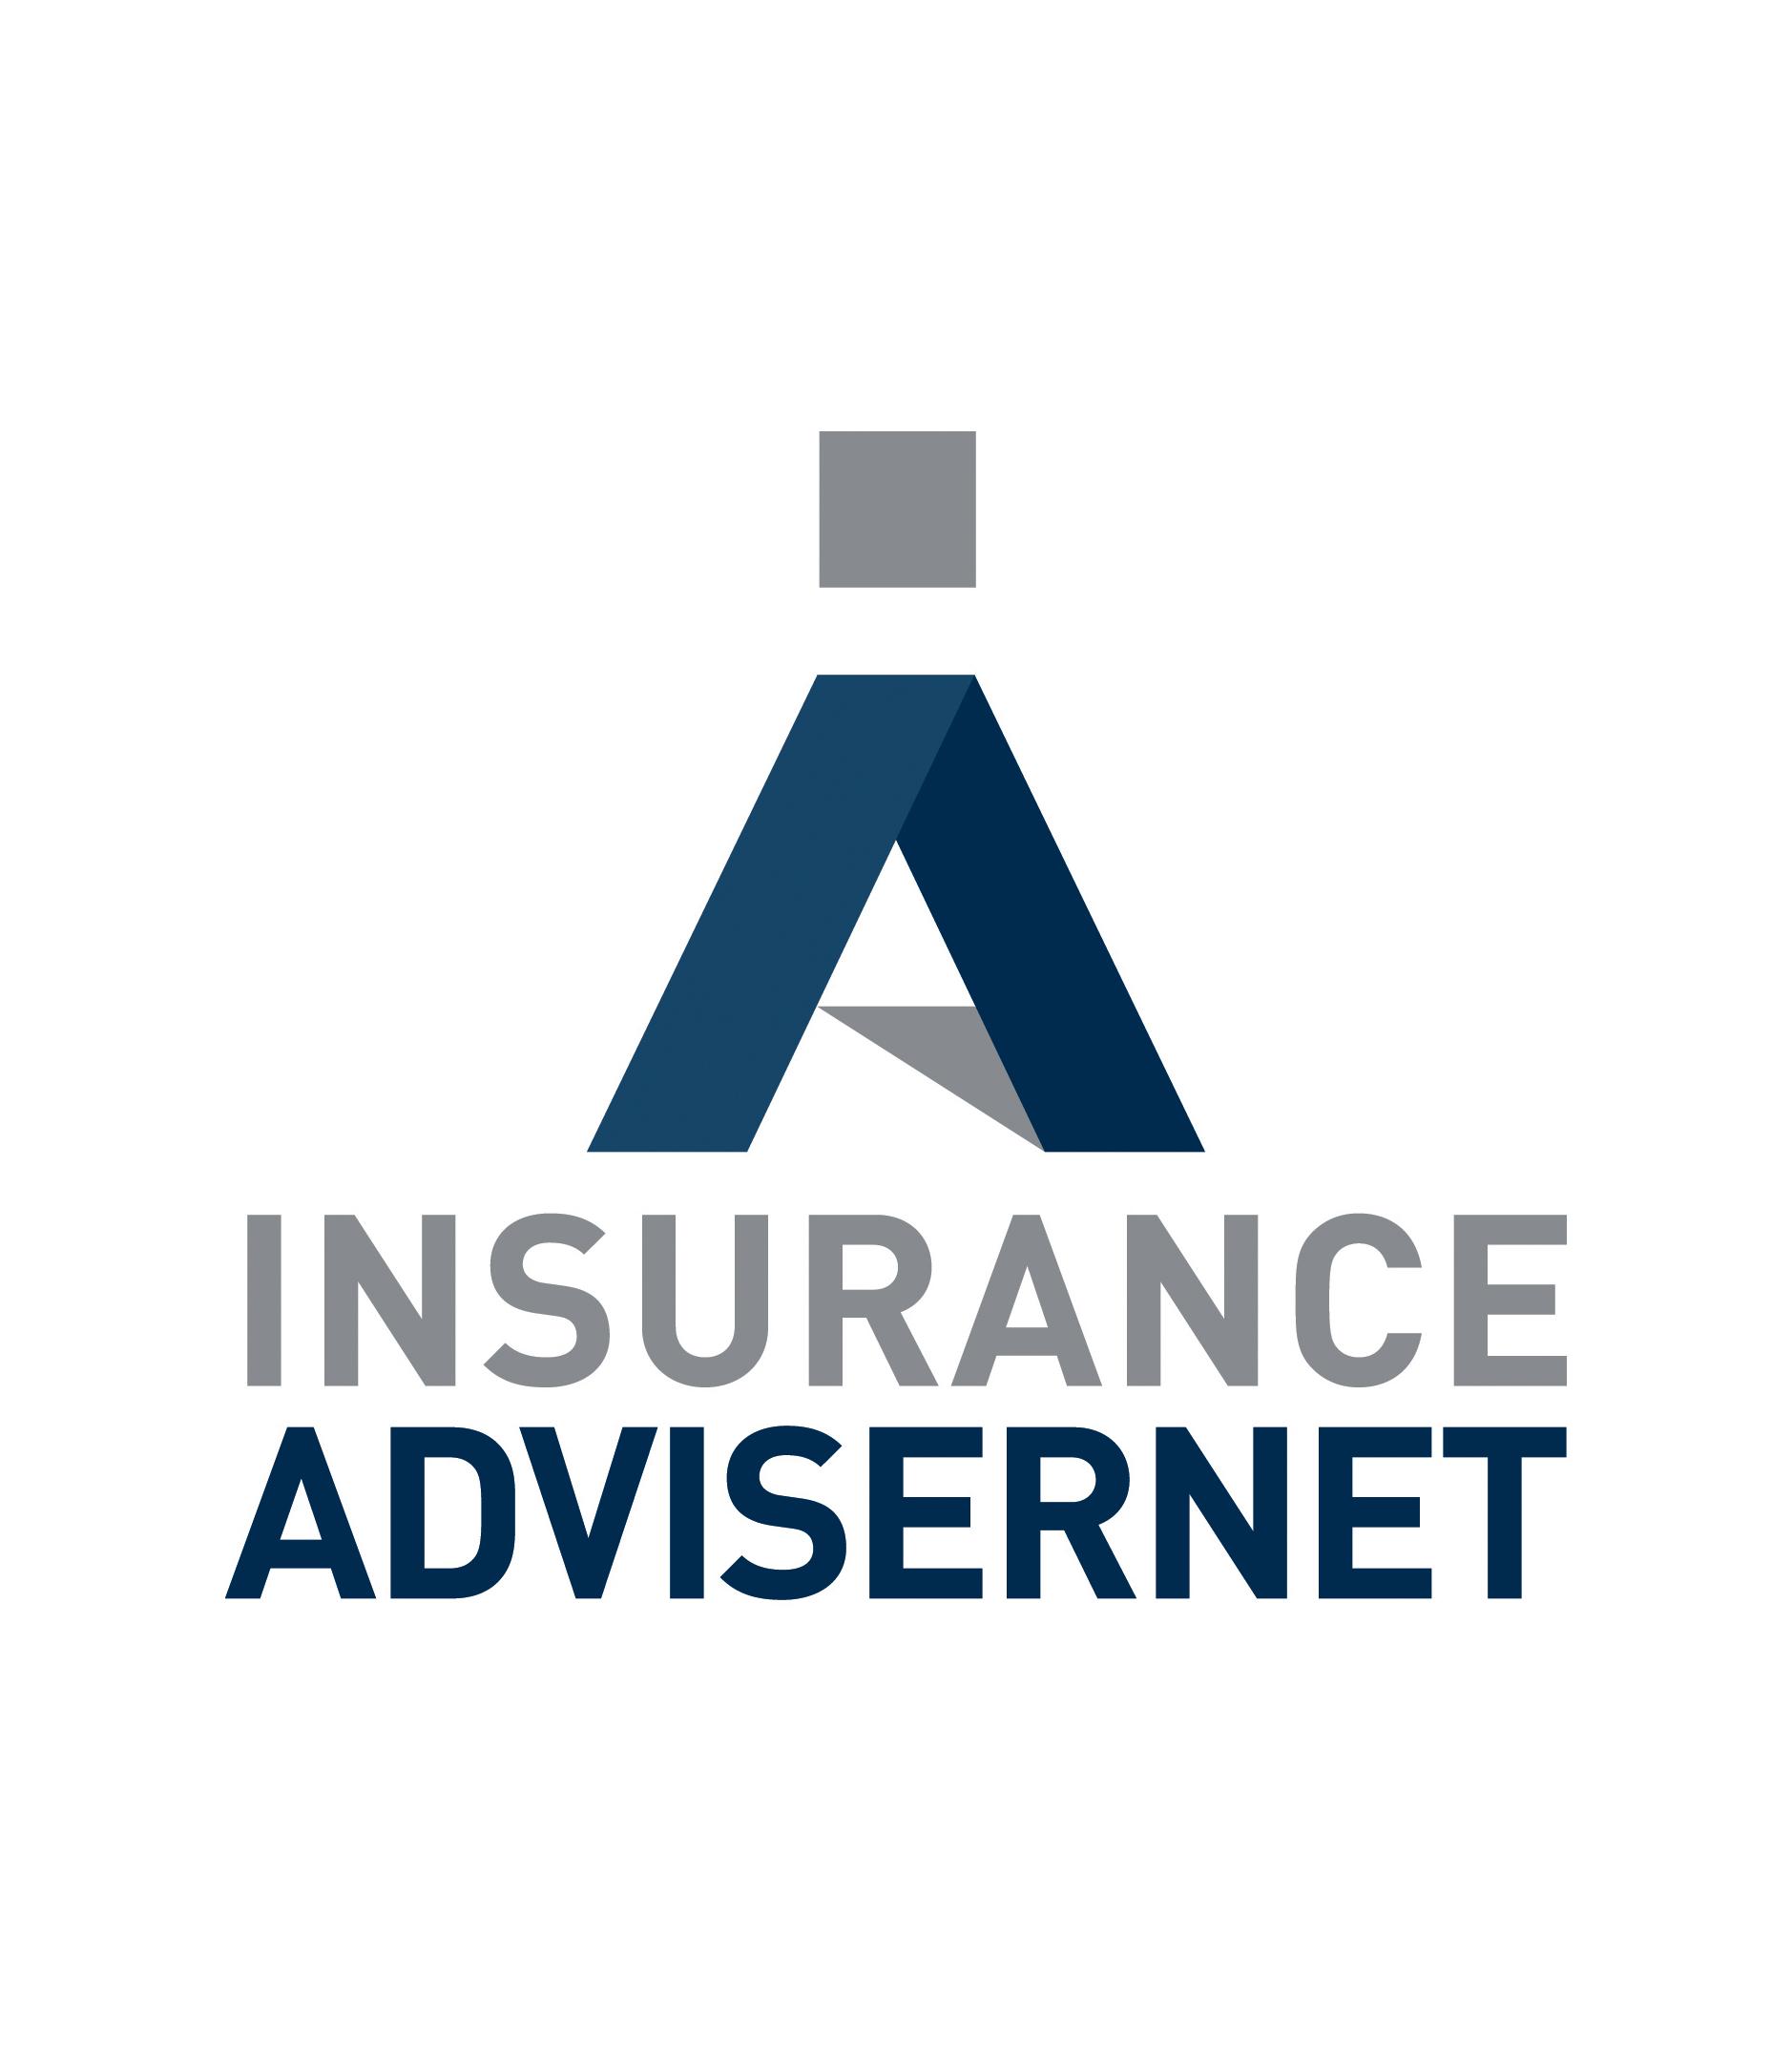 Insurance Advisernet New Zealand